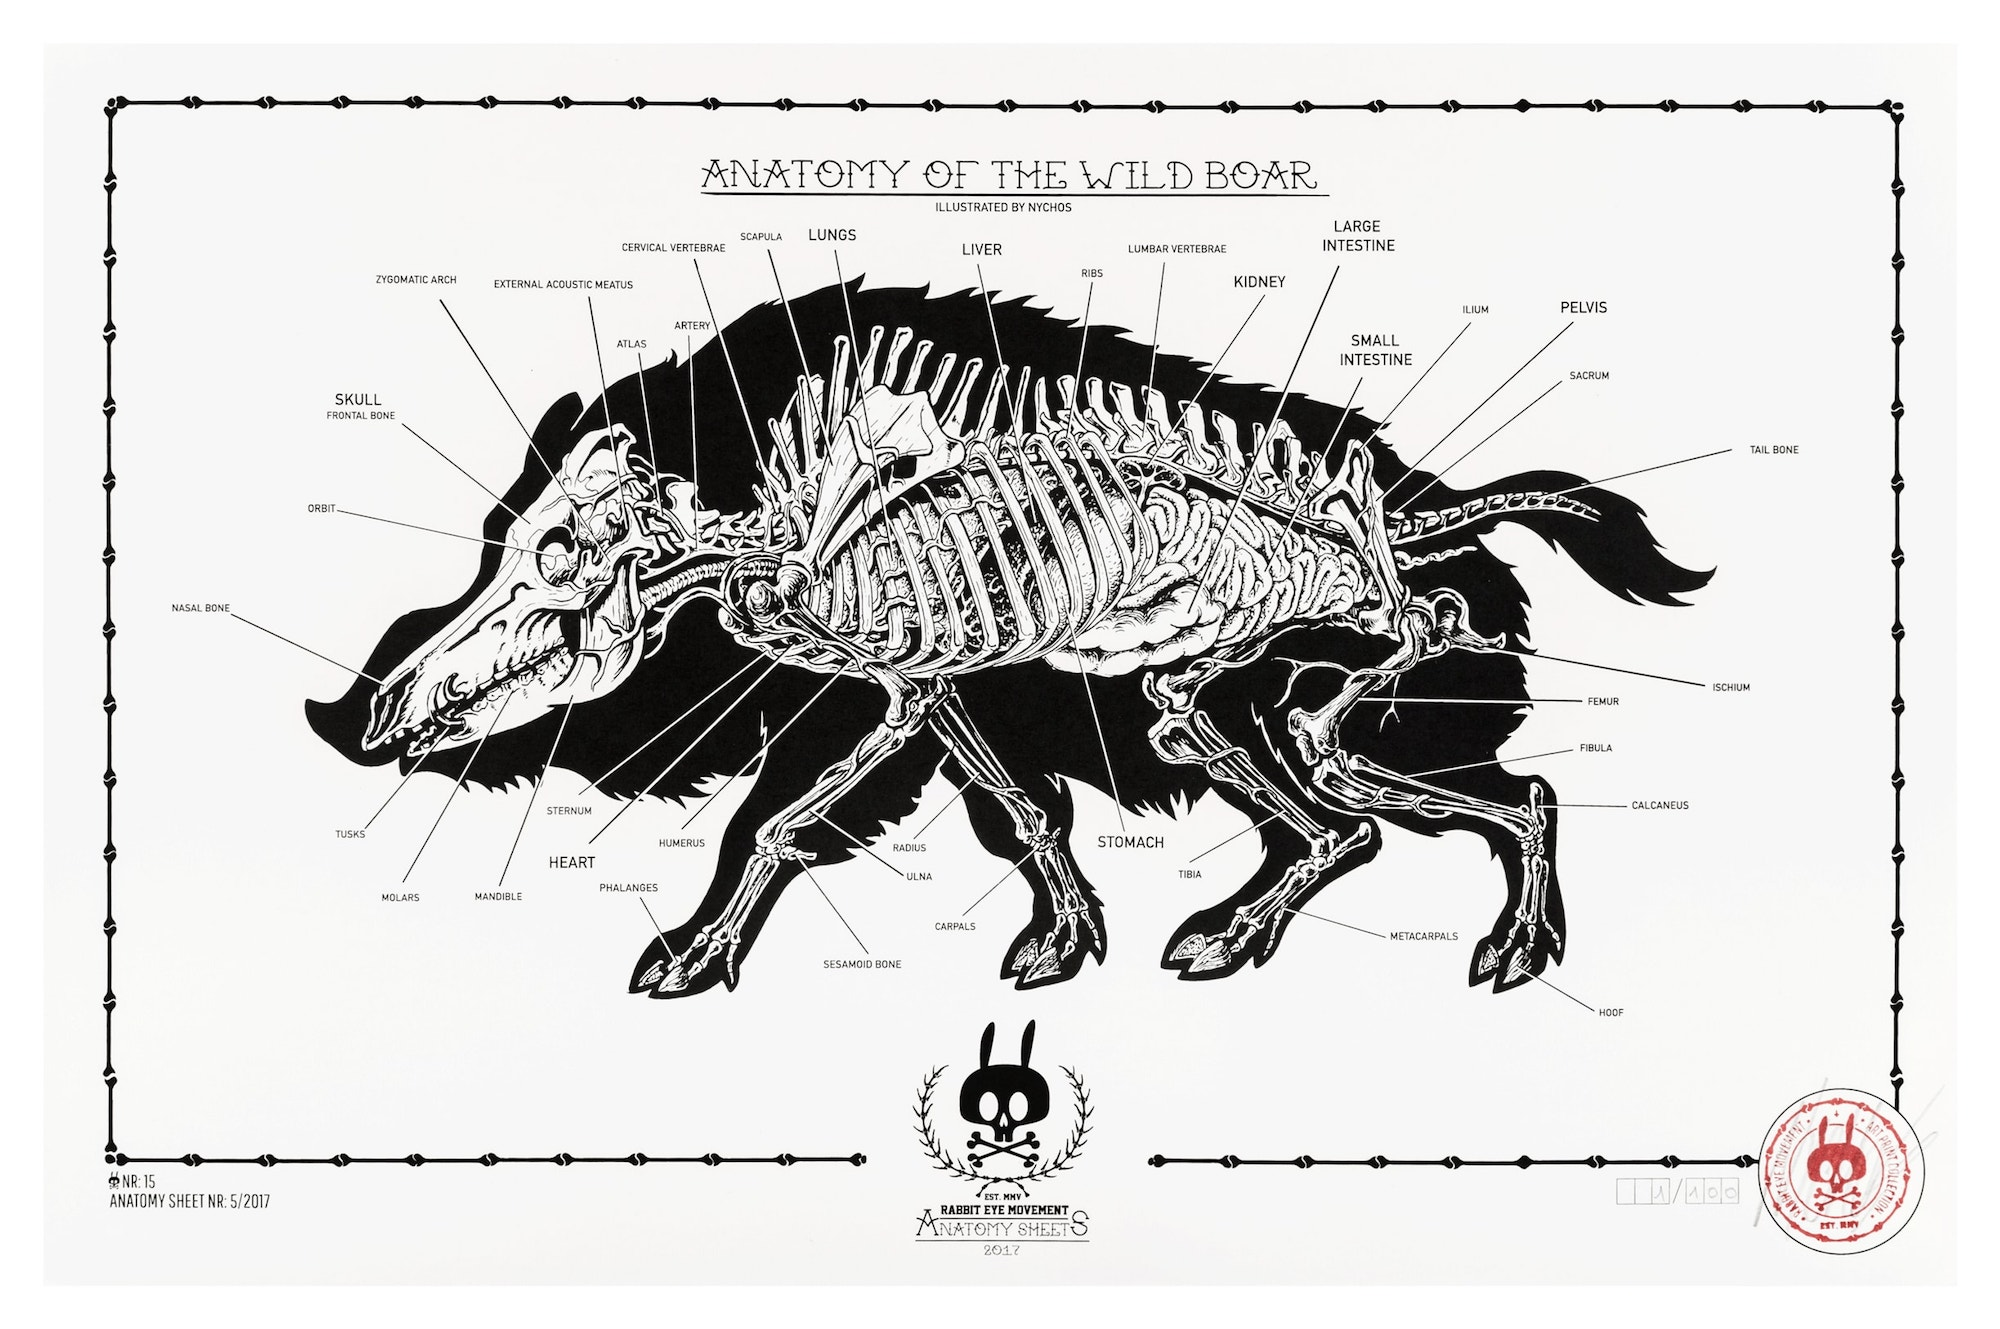 ANATOMY OF THE WILD BOAR: ANATOMY SHEET NO.15 - Rabbit Eye Movement Inc.